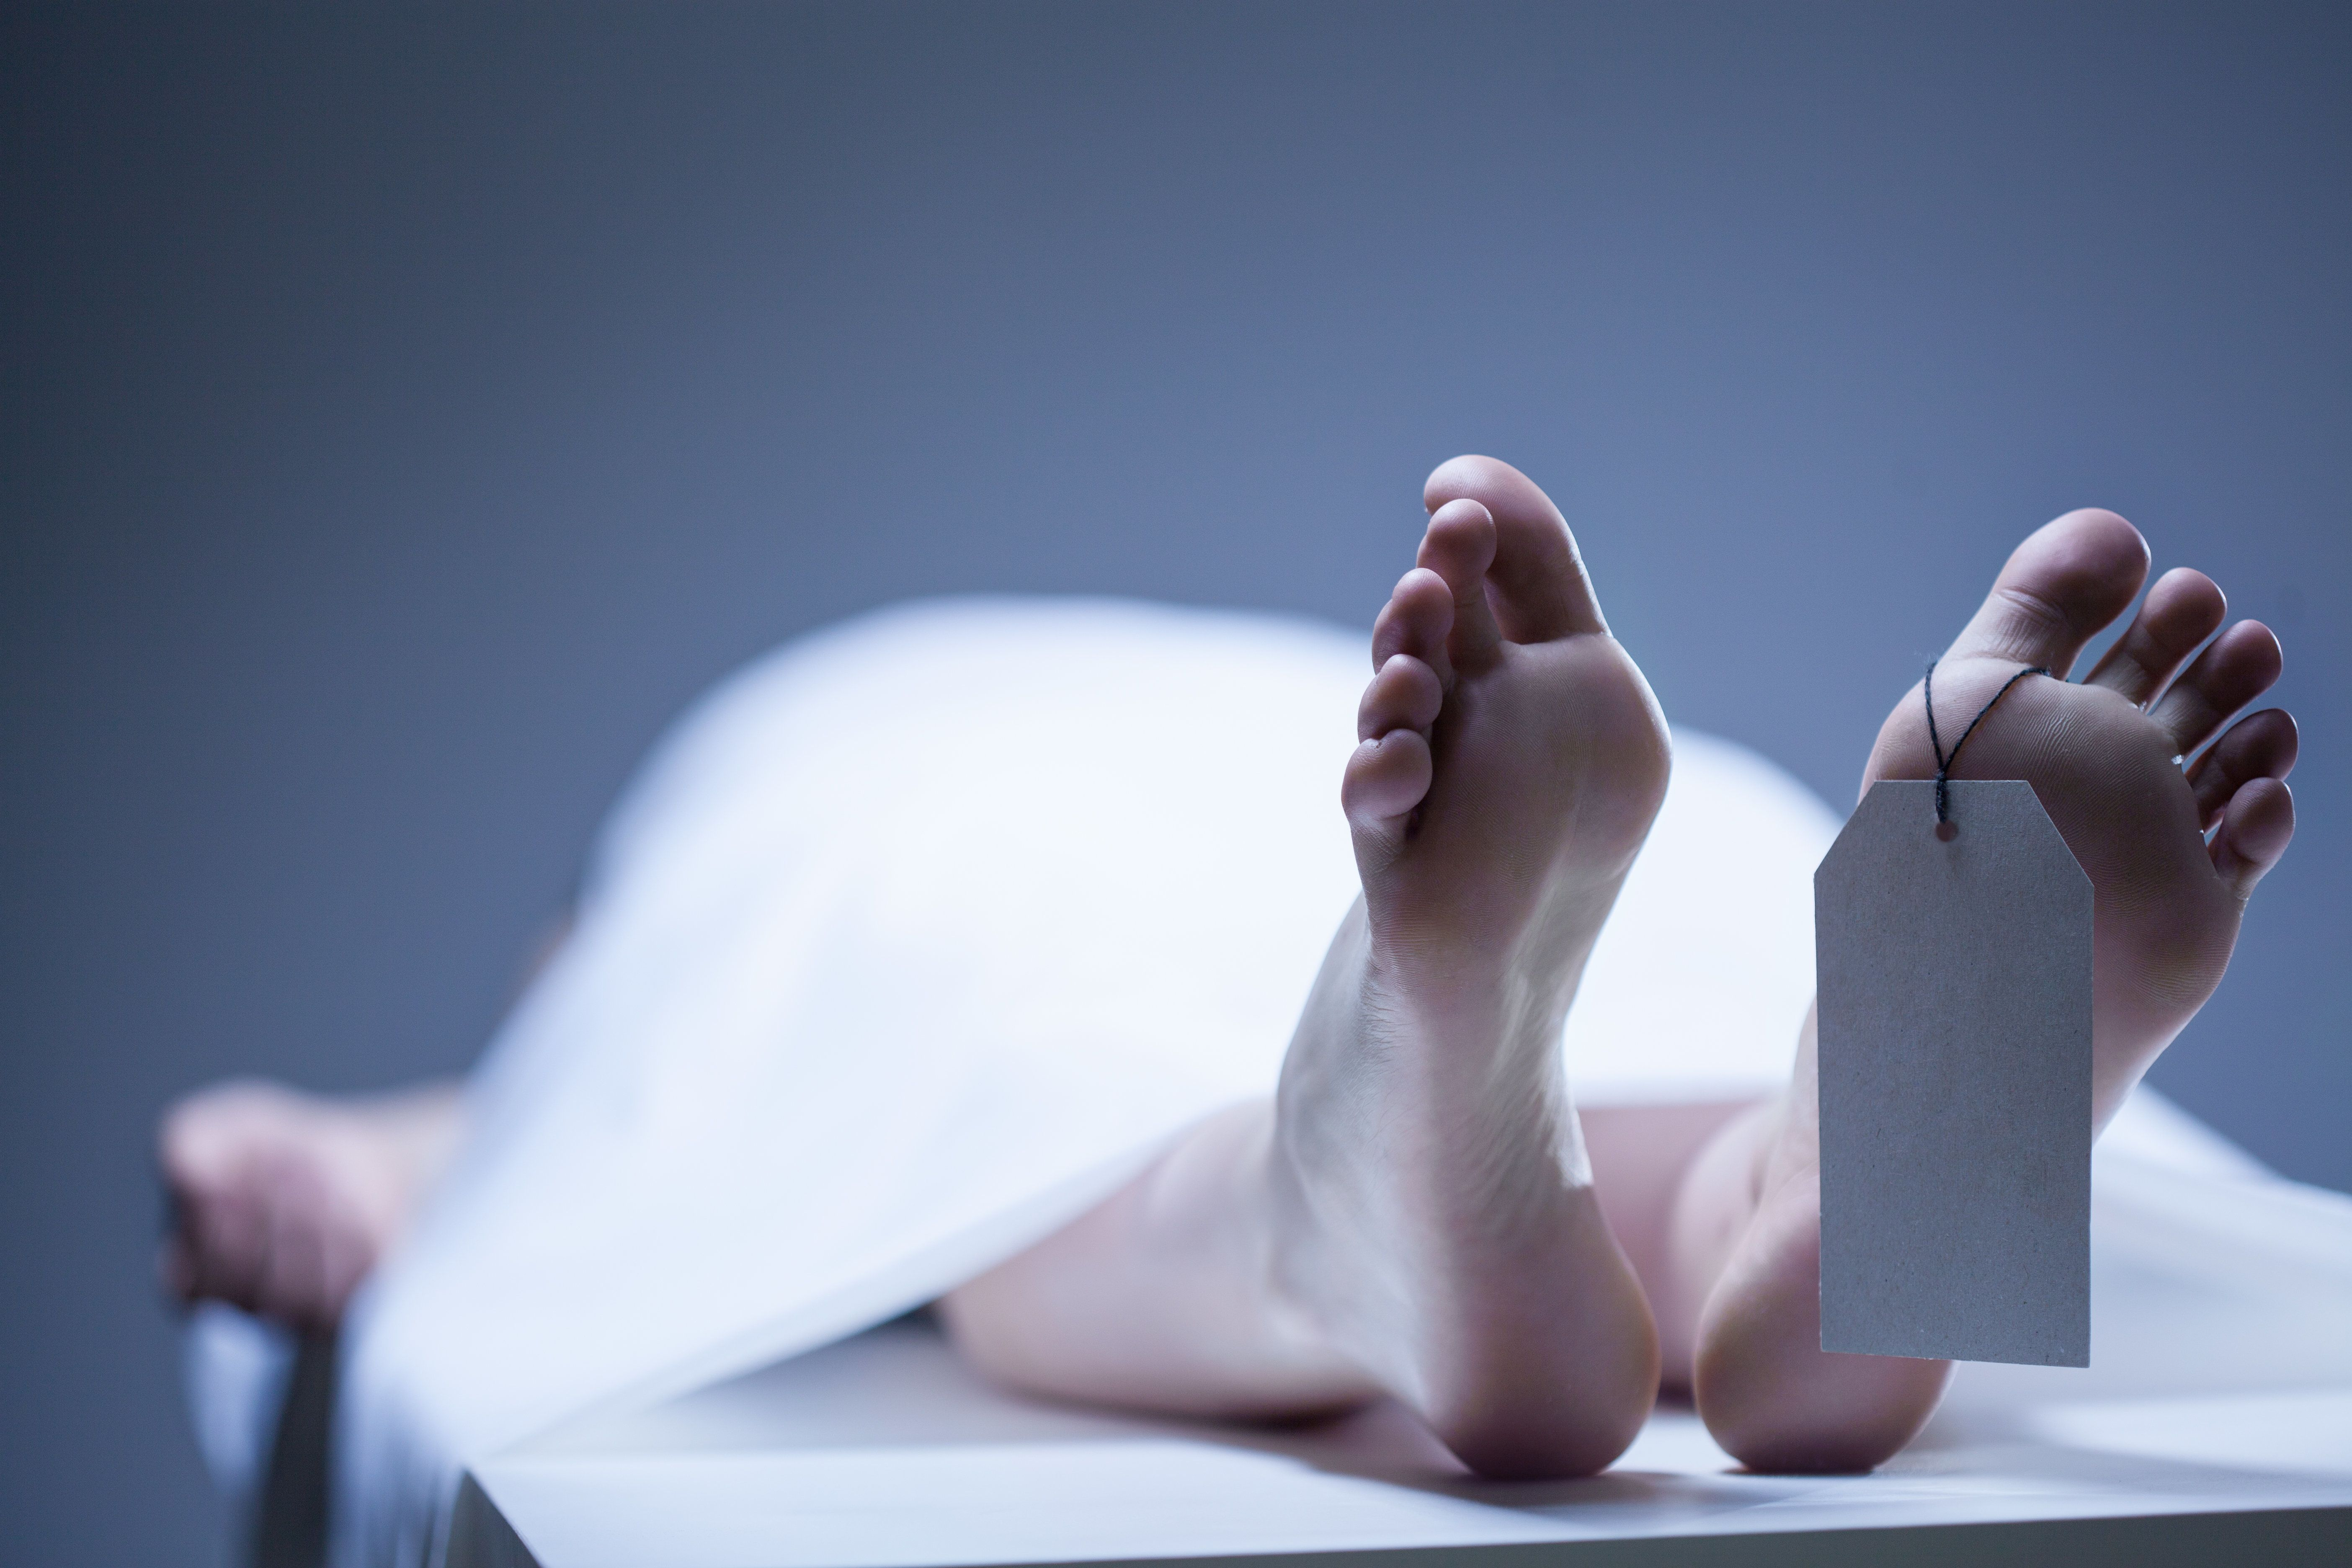 Frau wacht nach schwerem Autounfall im Leichenkühlschrank